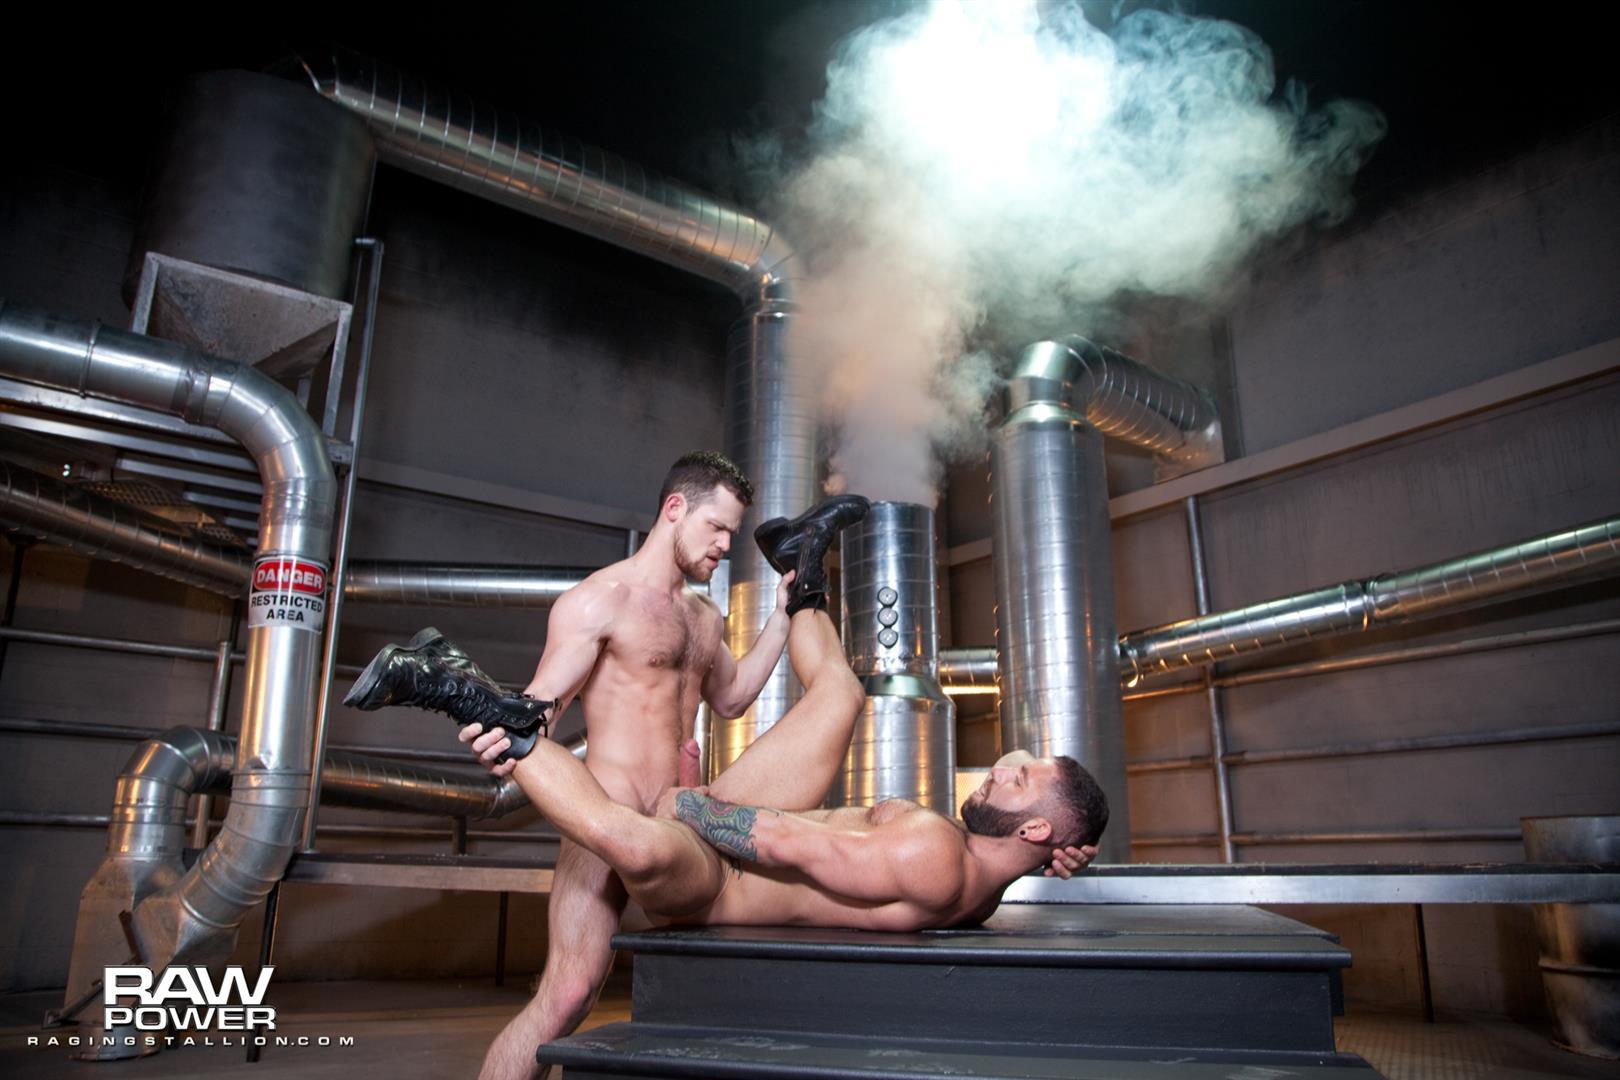 Raging-Stallion-Eddy-Ceetee-and-Kurtis-Wolfe-Big-Dick-Muscle-Hunks-Bareback-Sex-Video-15 ALERT: Raging Stallion Goes Bareback For The First Time With Eddy Ceetee and Kurtis Wolfe